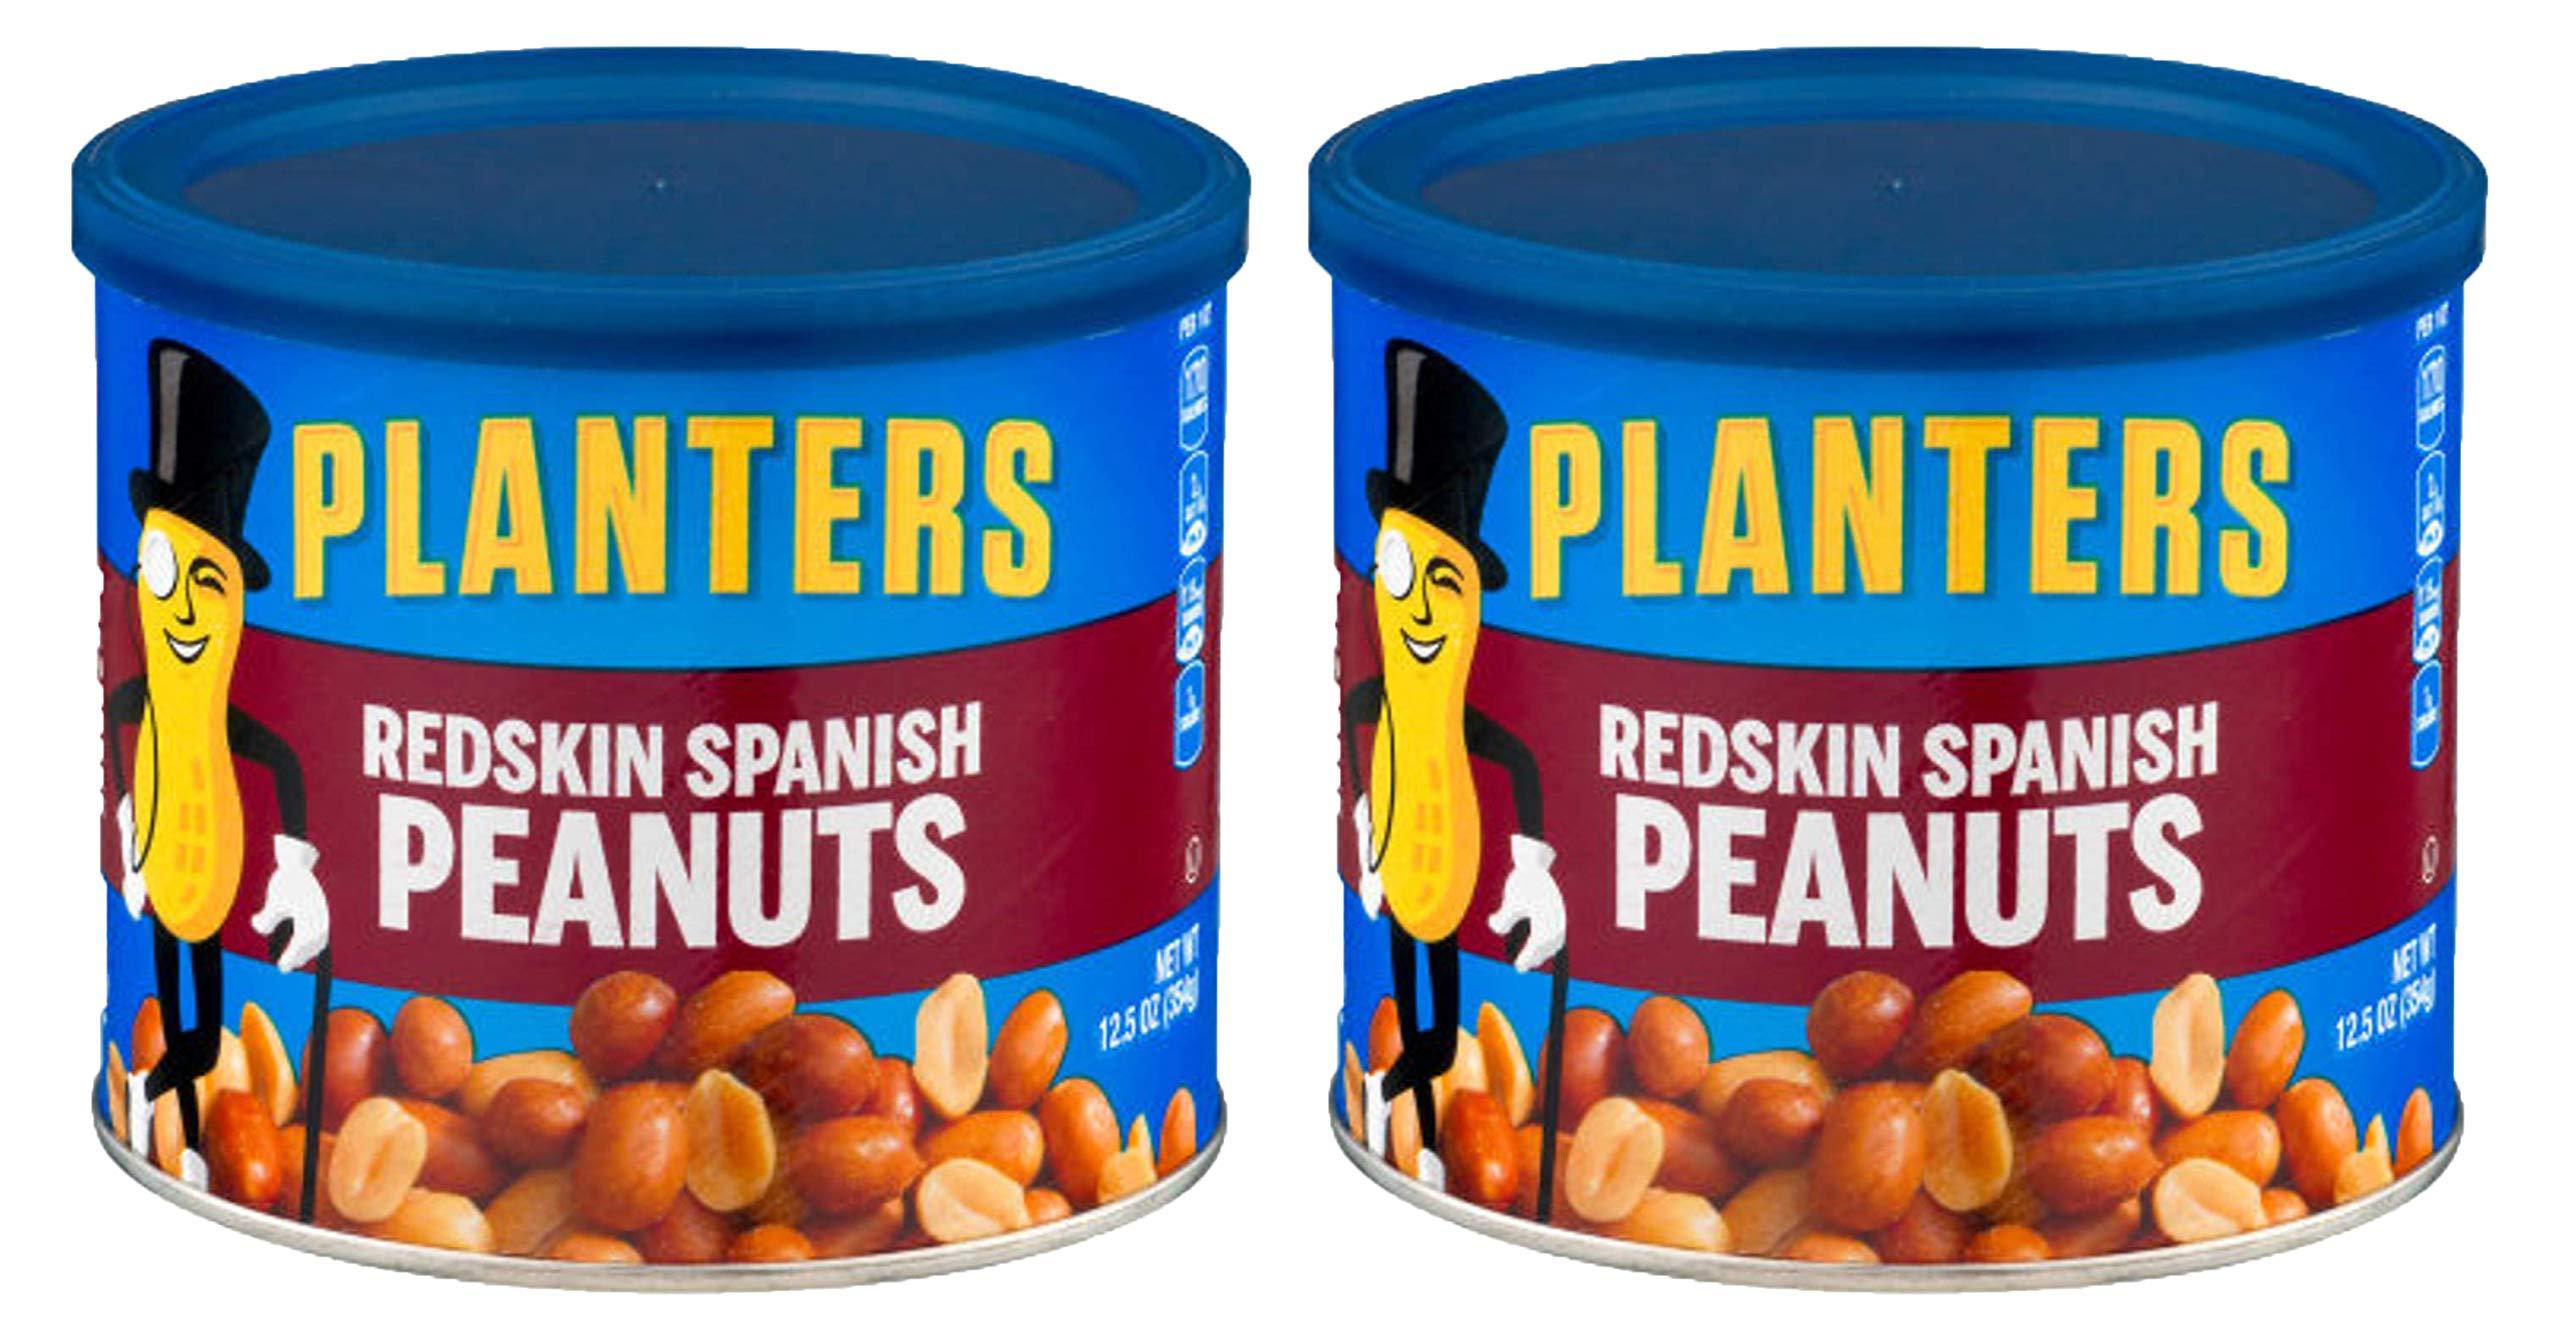 Planters Peanuts, Spanish Rdskn w/ Sea Salt, 12.5 oz, 2 pk by Planters (Image #1)